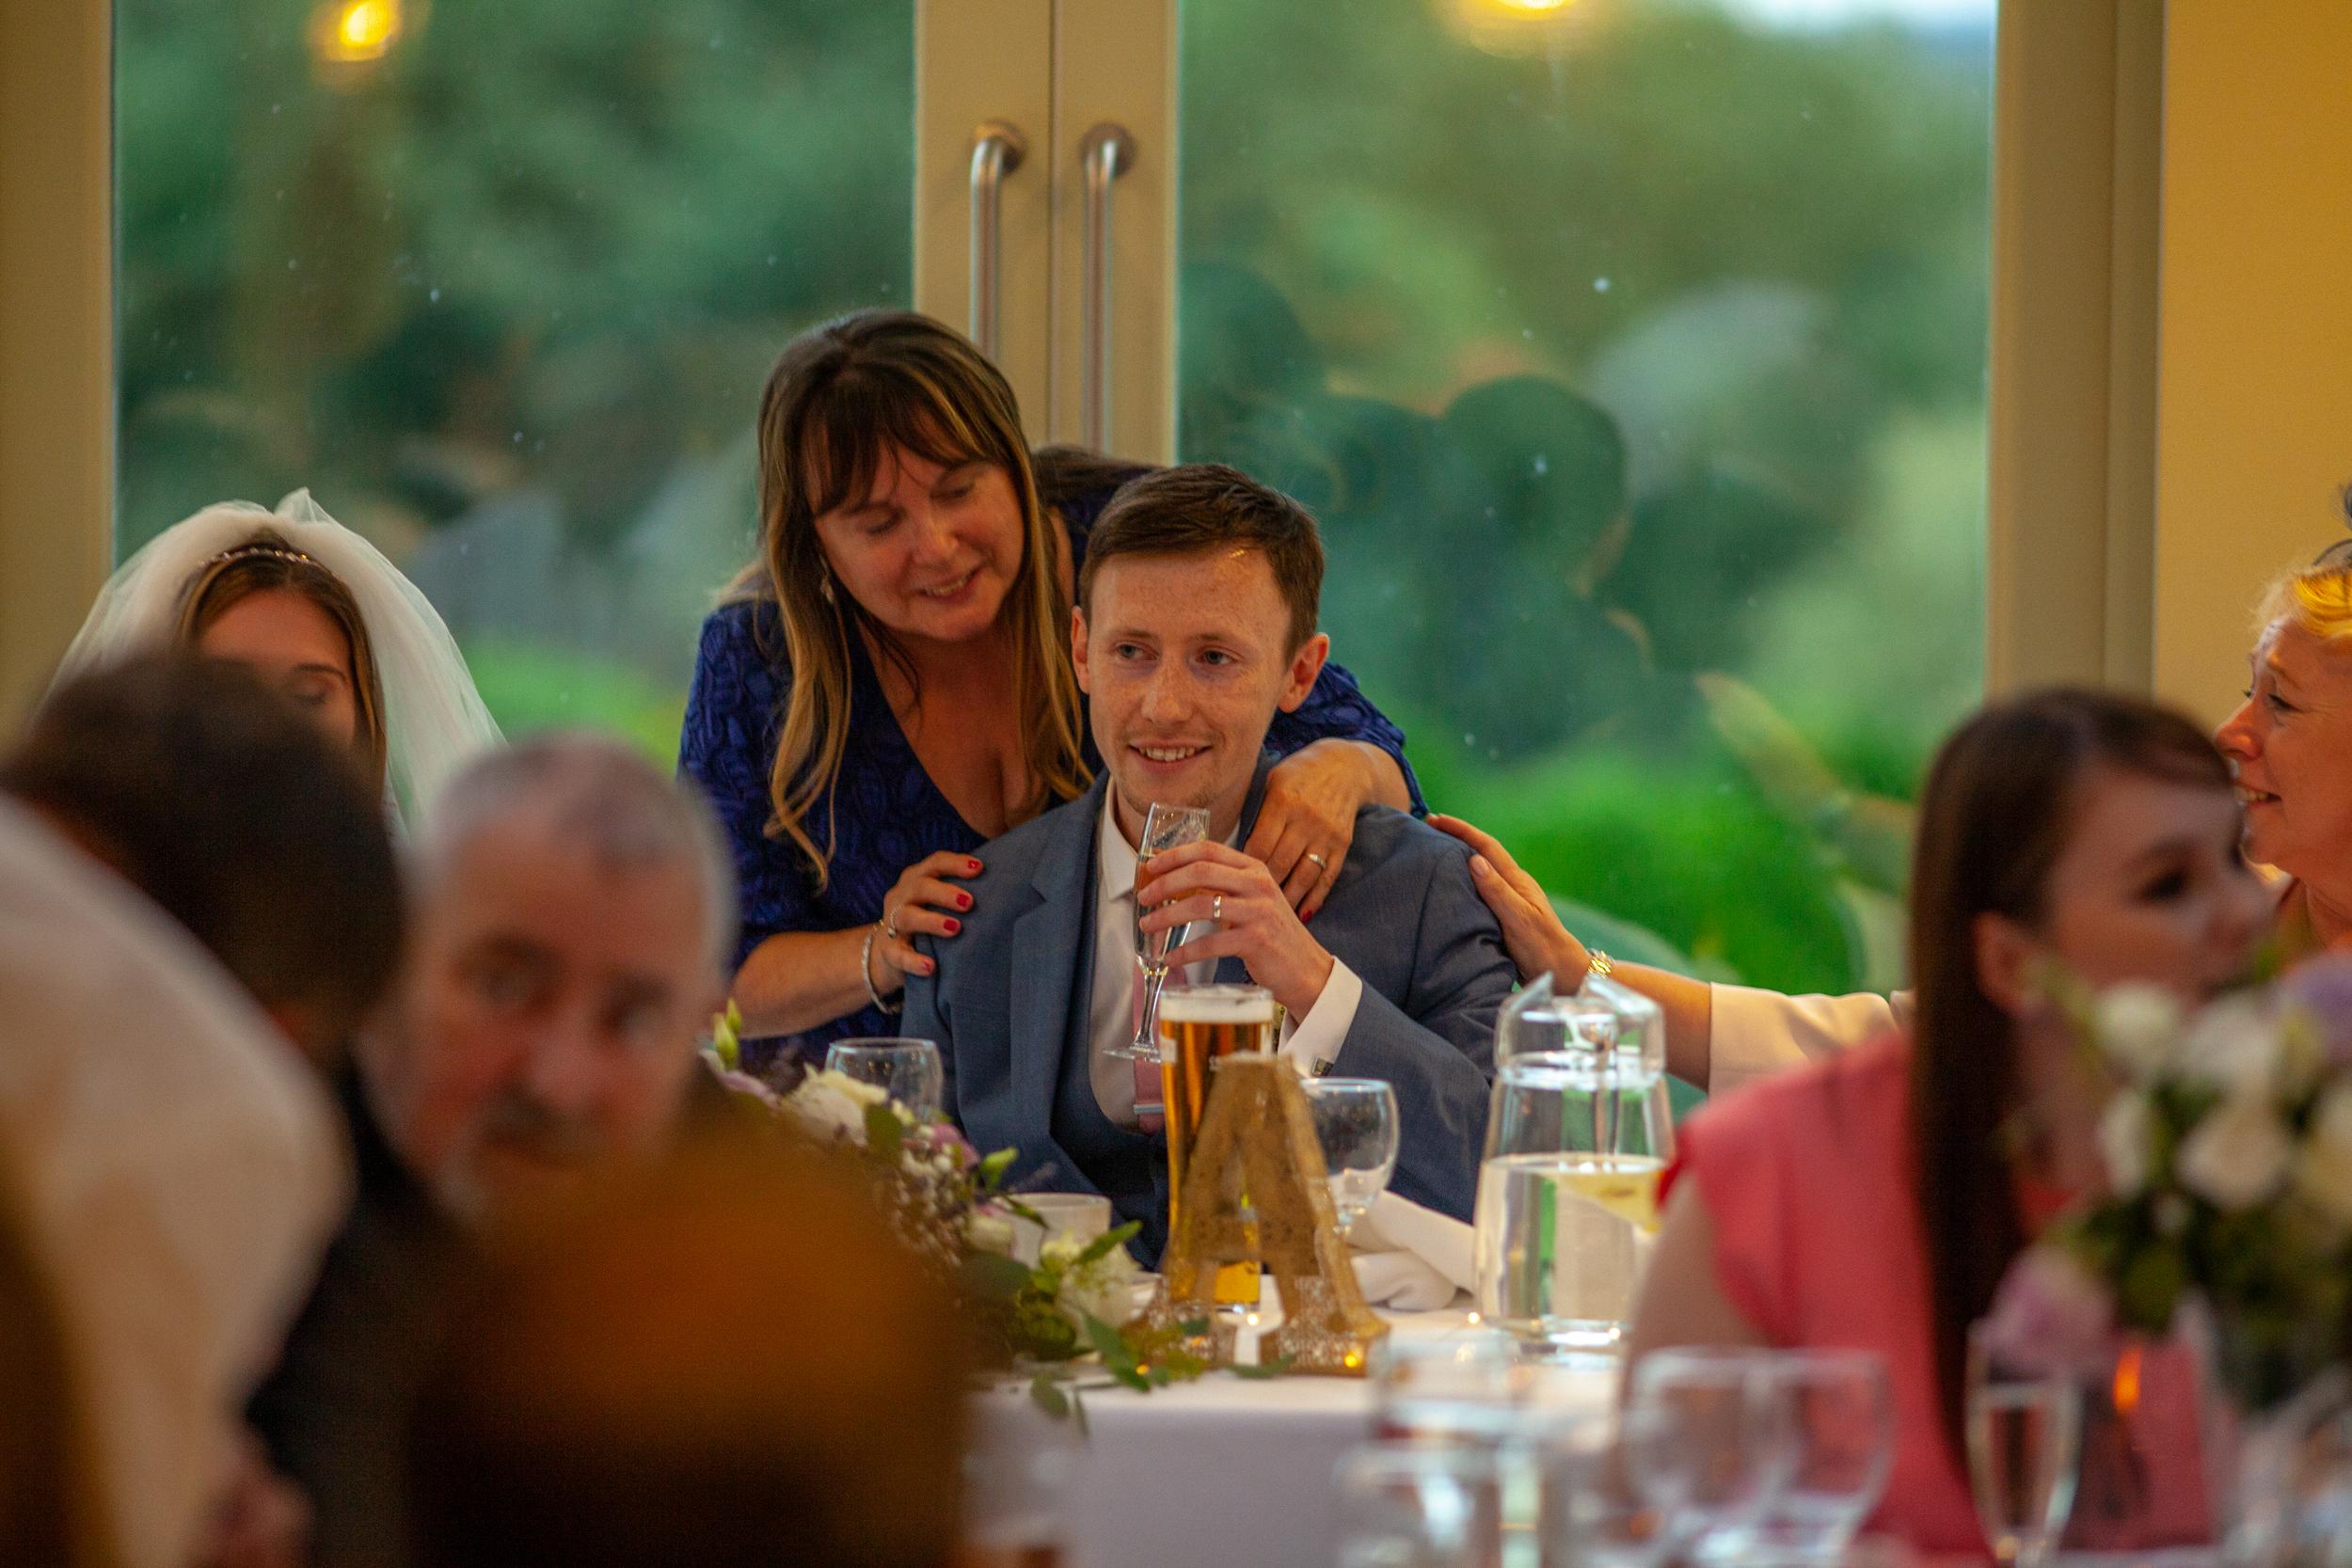 Charringworth-Manor-Wedding-Photography41.jpg